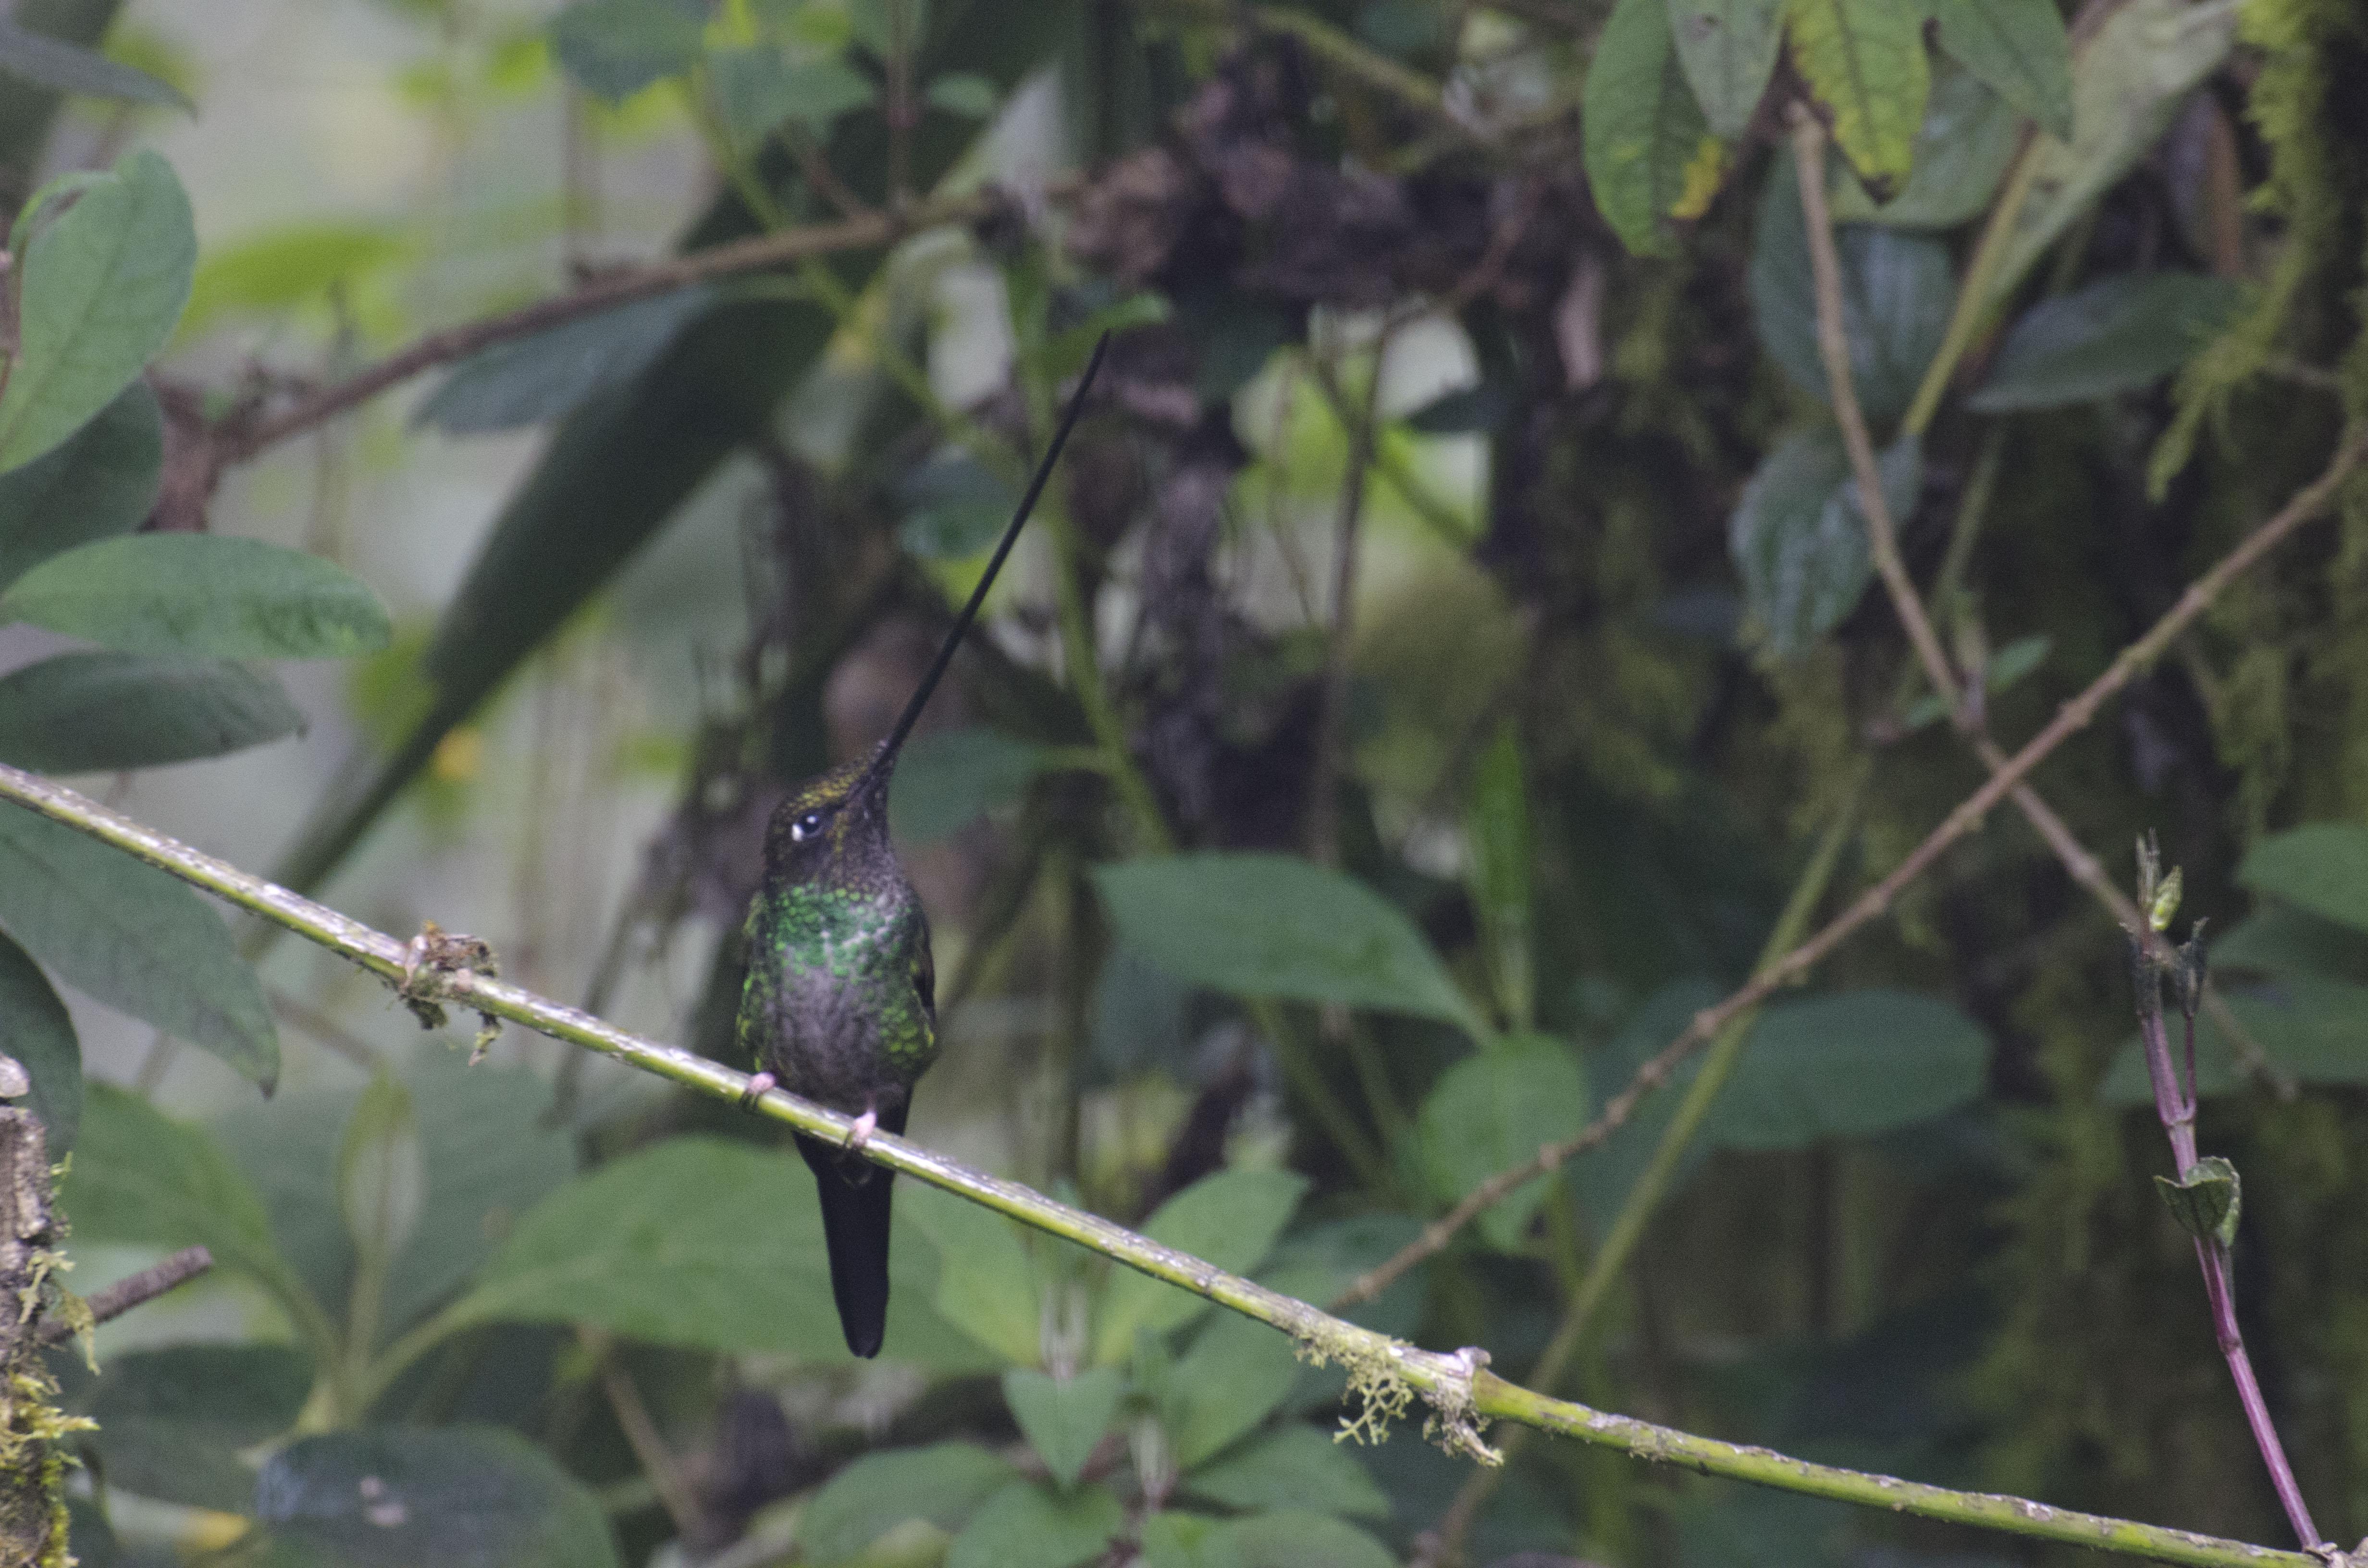 A Sword-billed Hummingbird at rest.